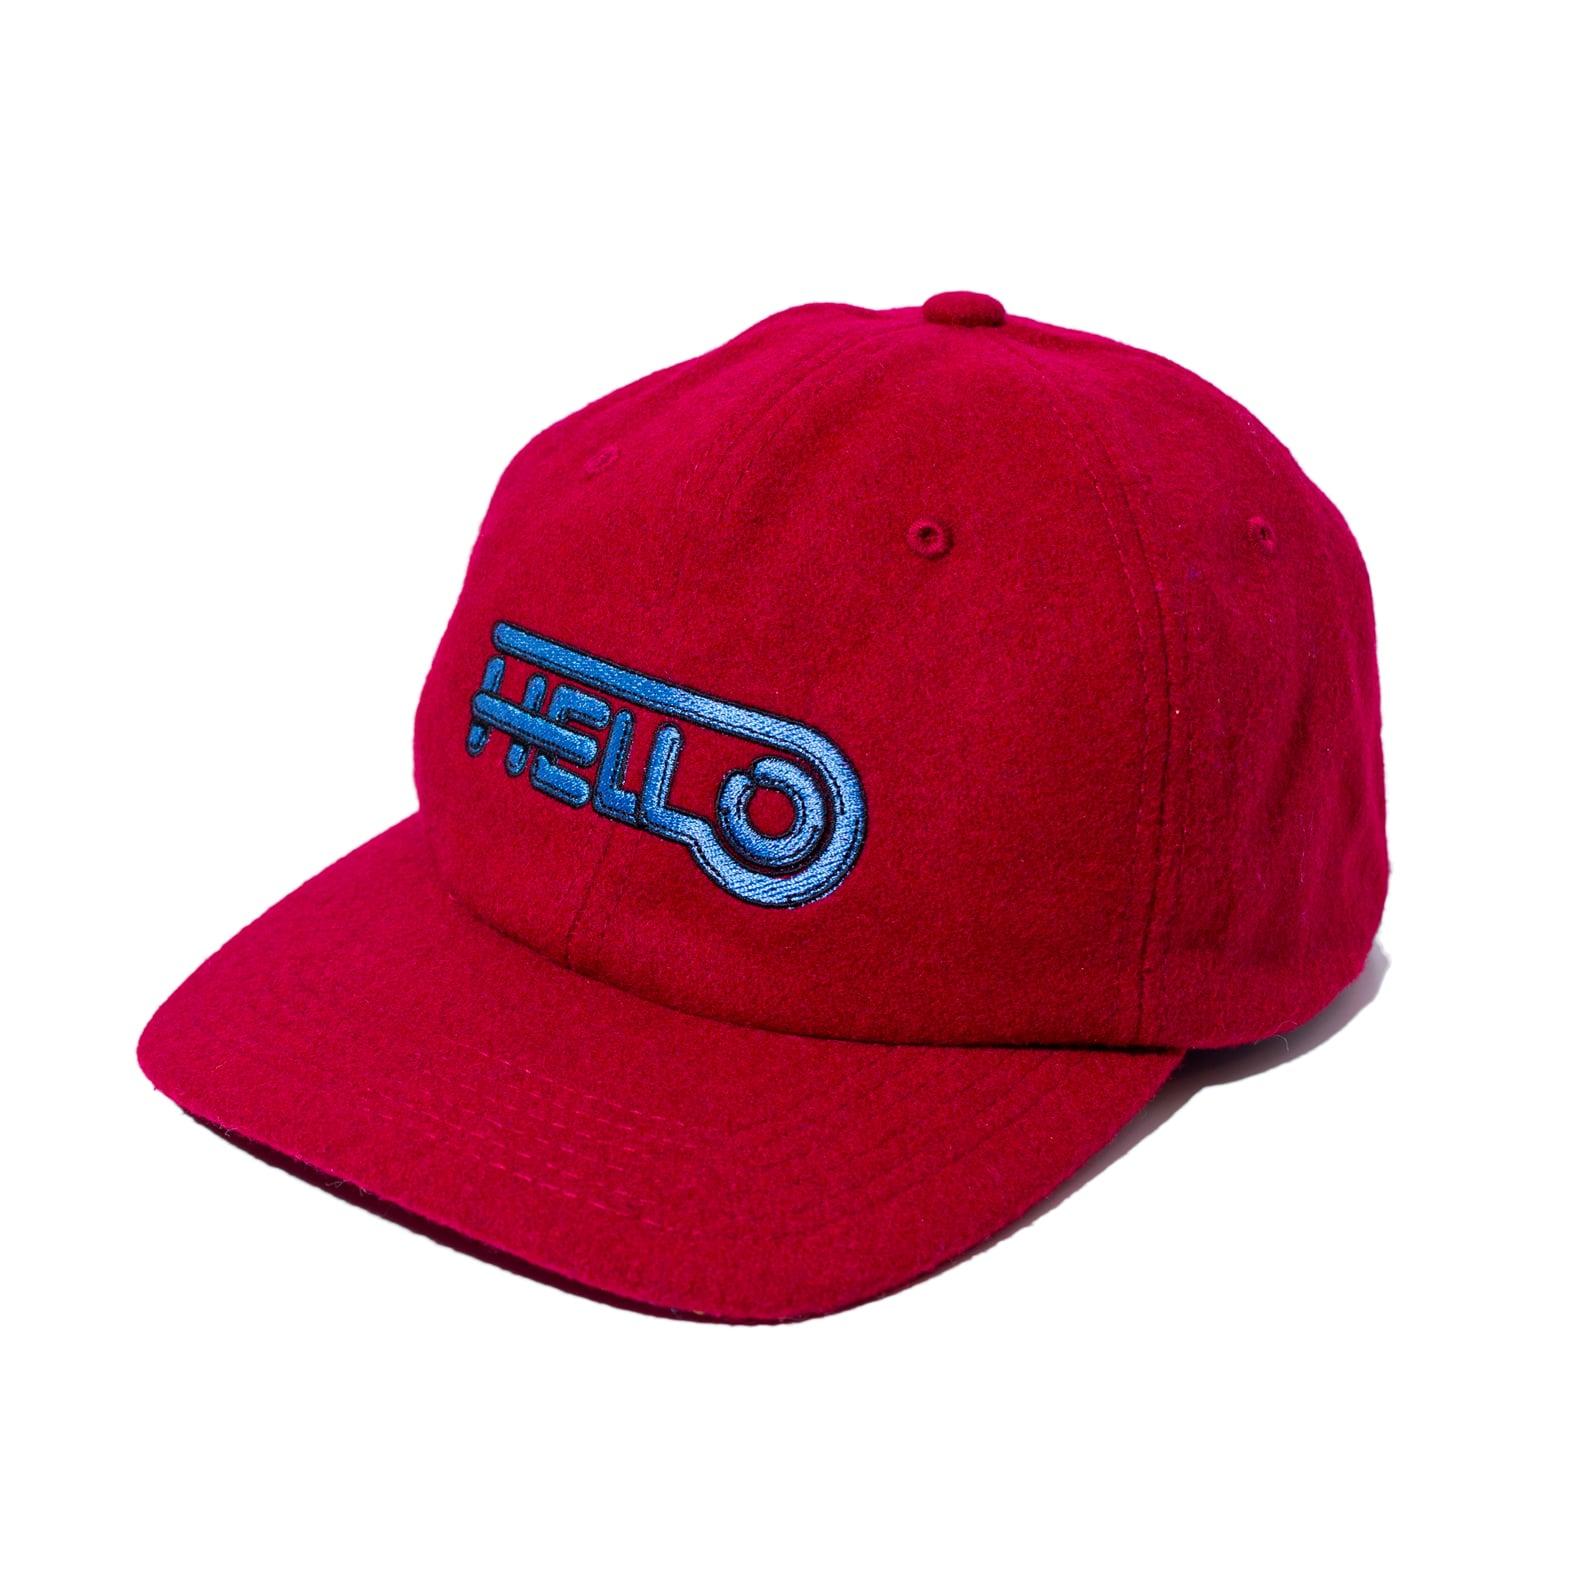 HELLO WOOL BB CAP #RED